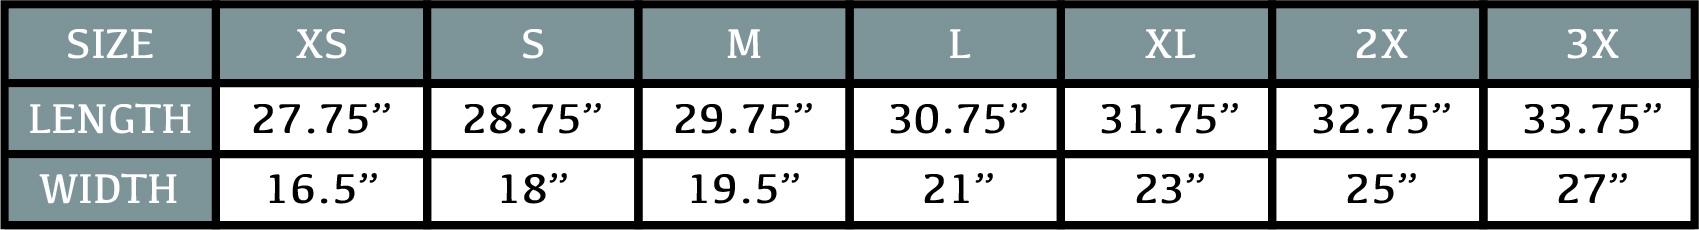 NL CVC Thermal Hoodie Size Chart.jpg